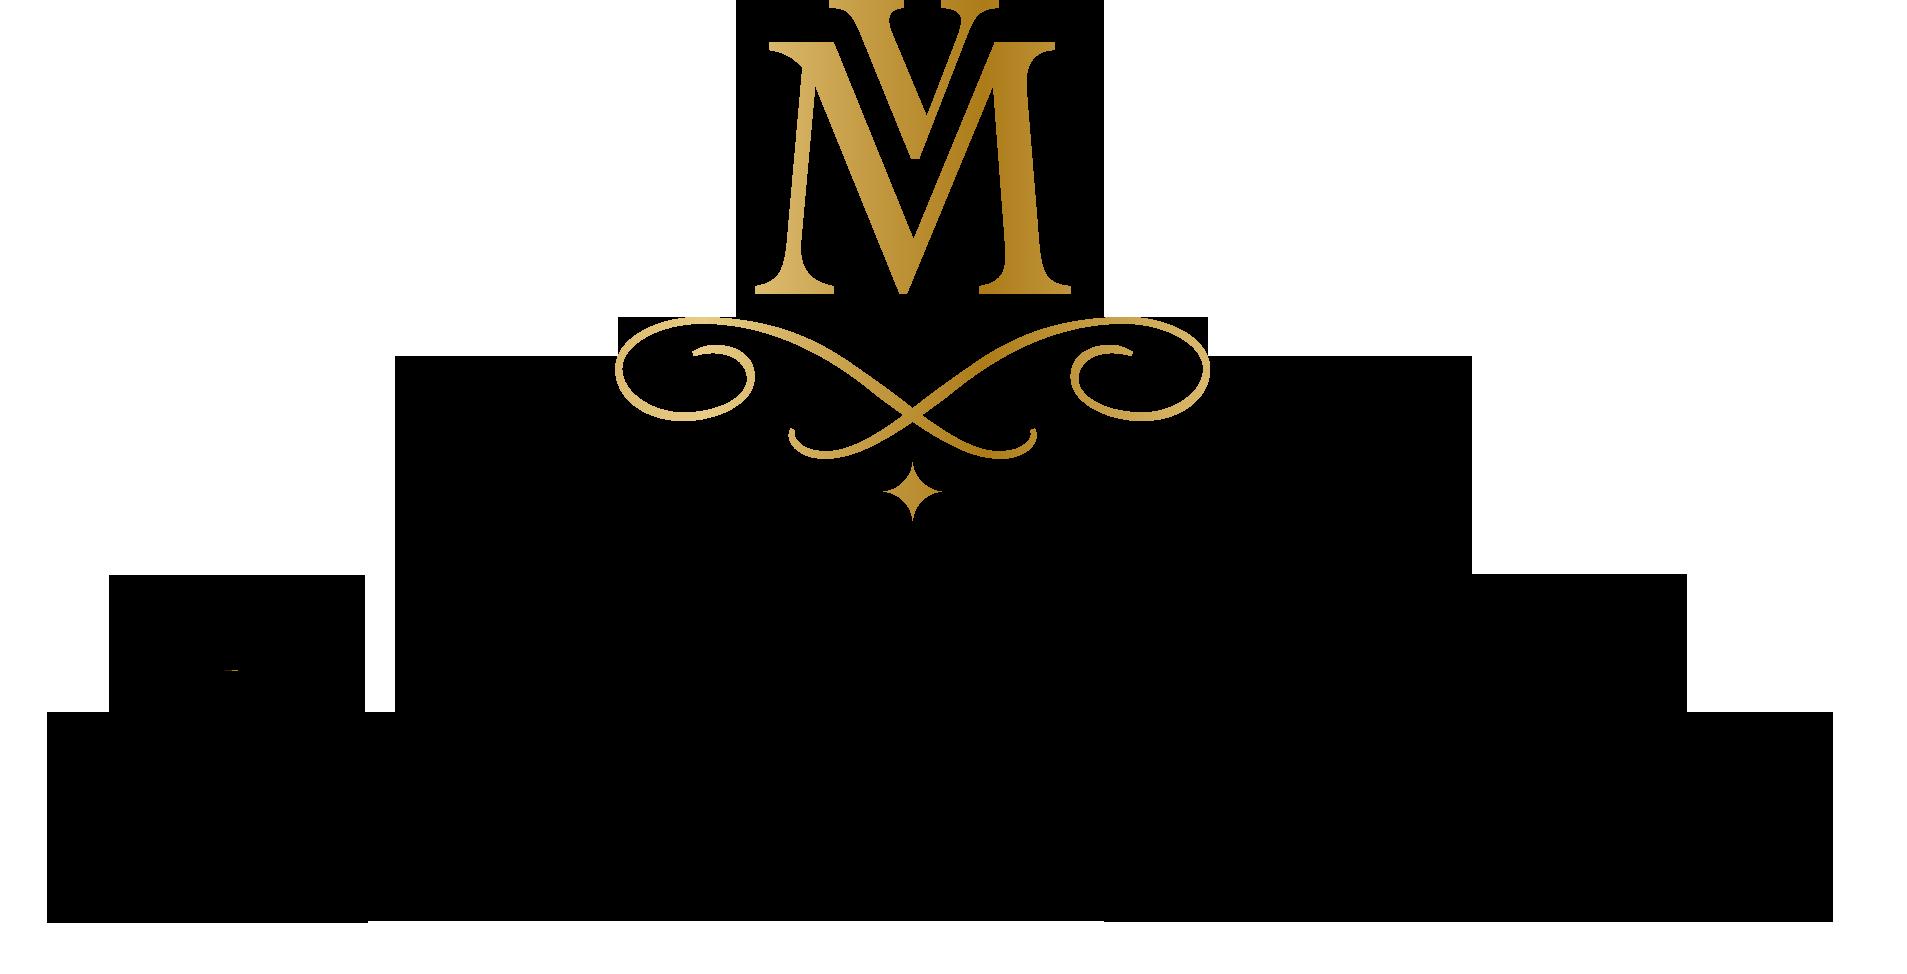 hab-vina-mayor-logos-2